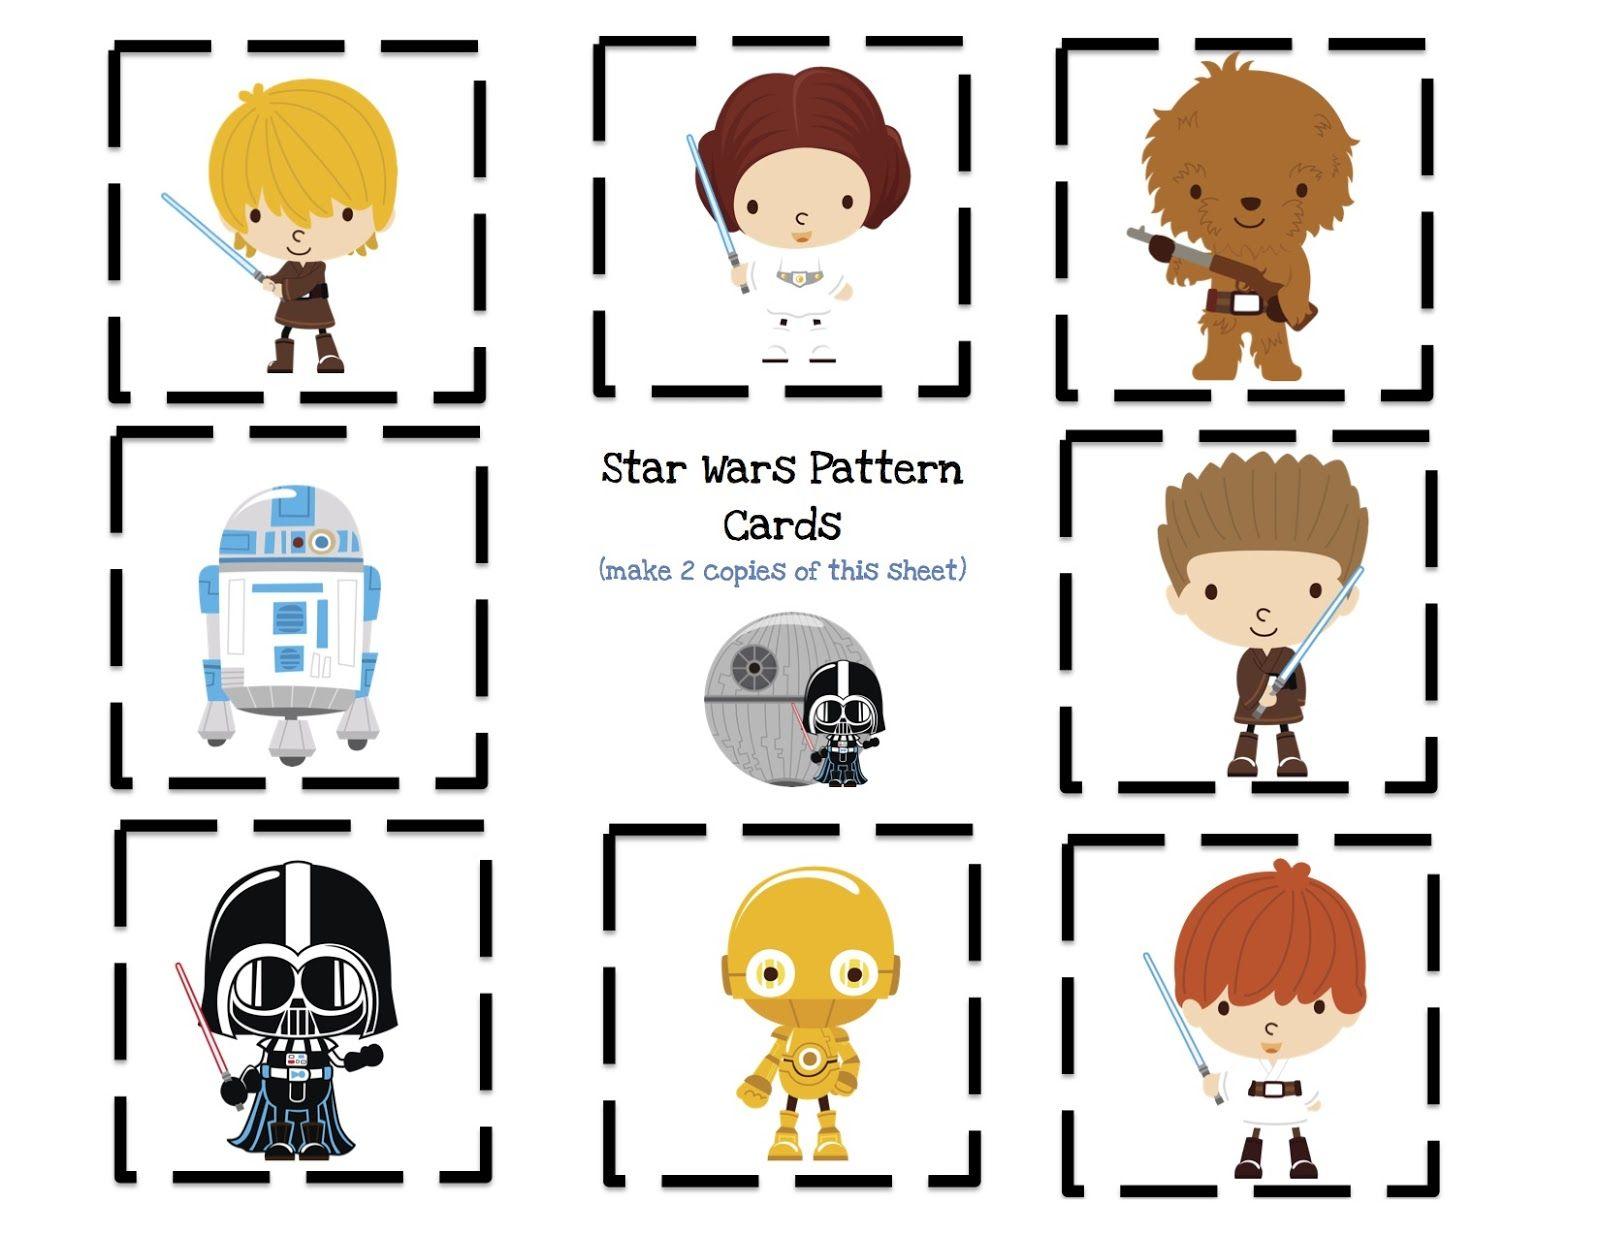 Star Wars Pattern Cards